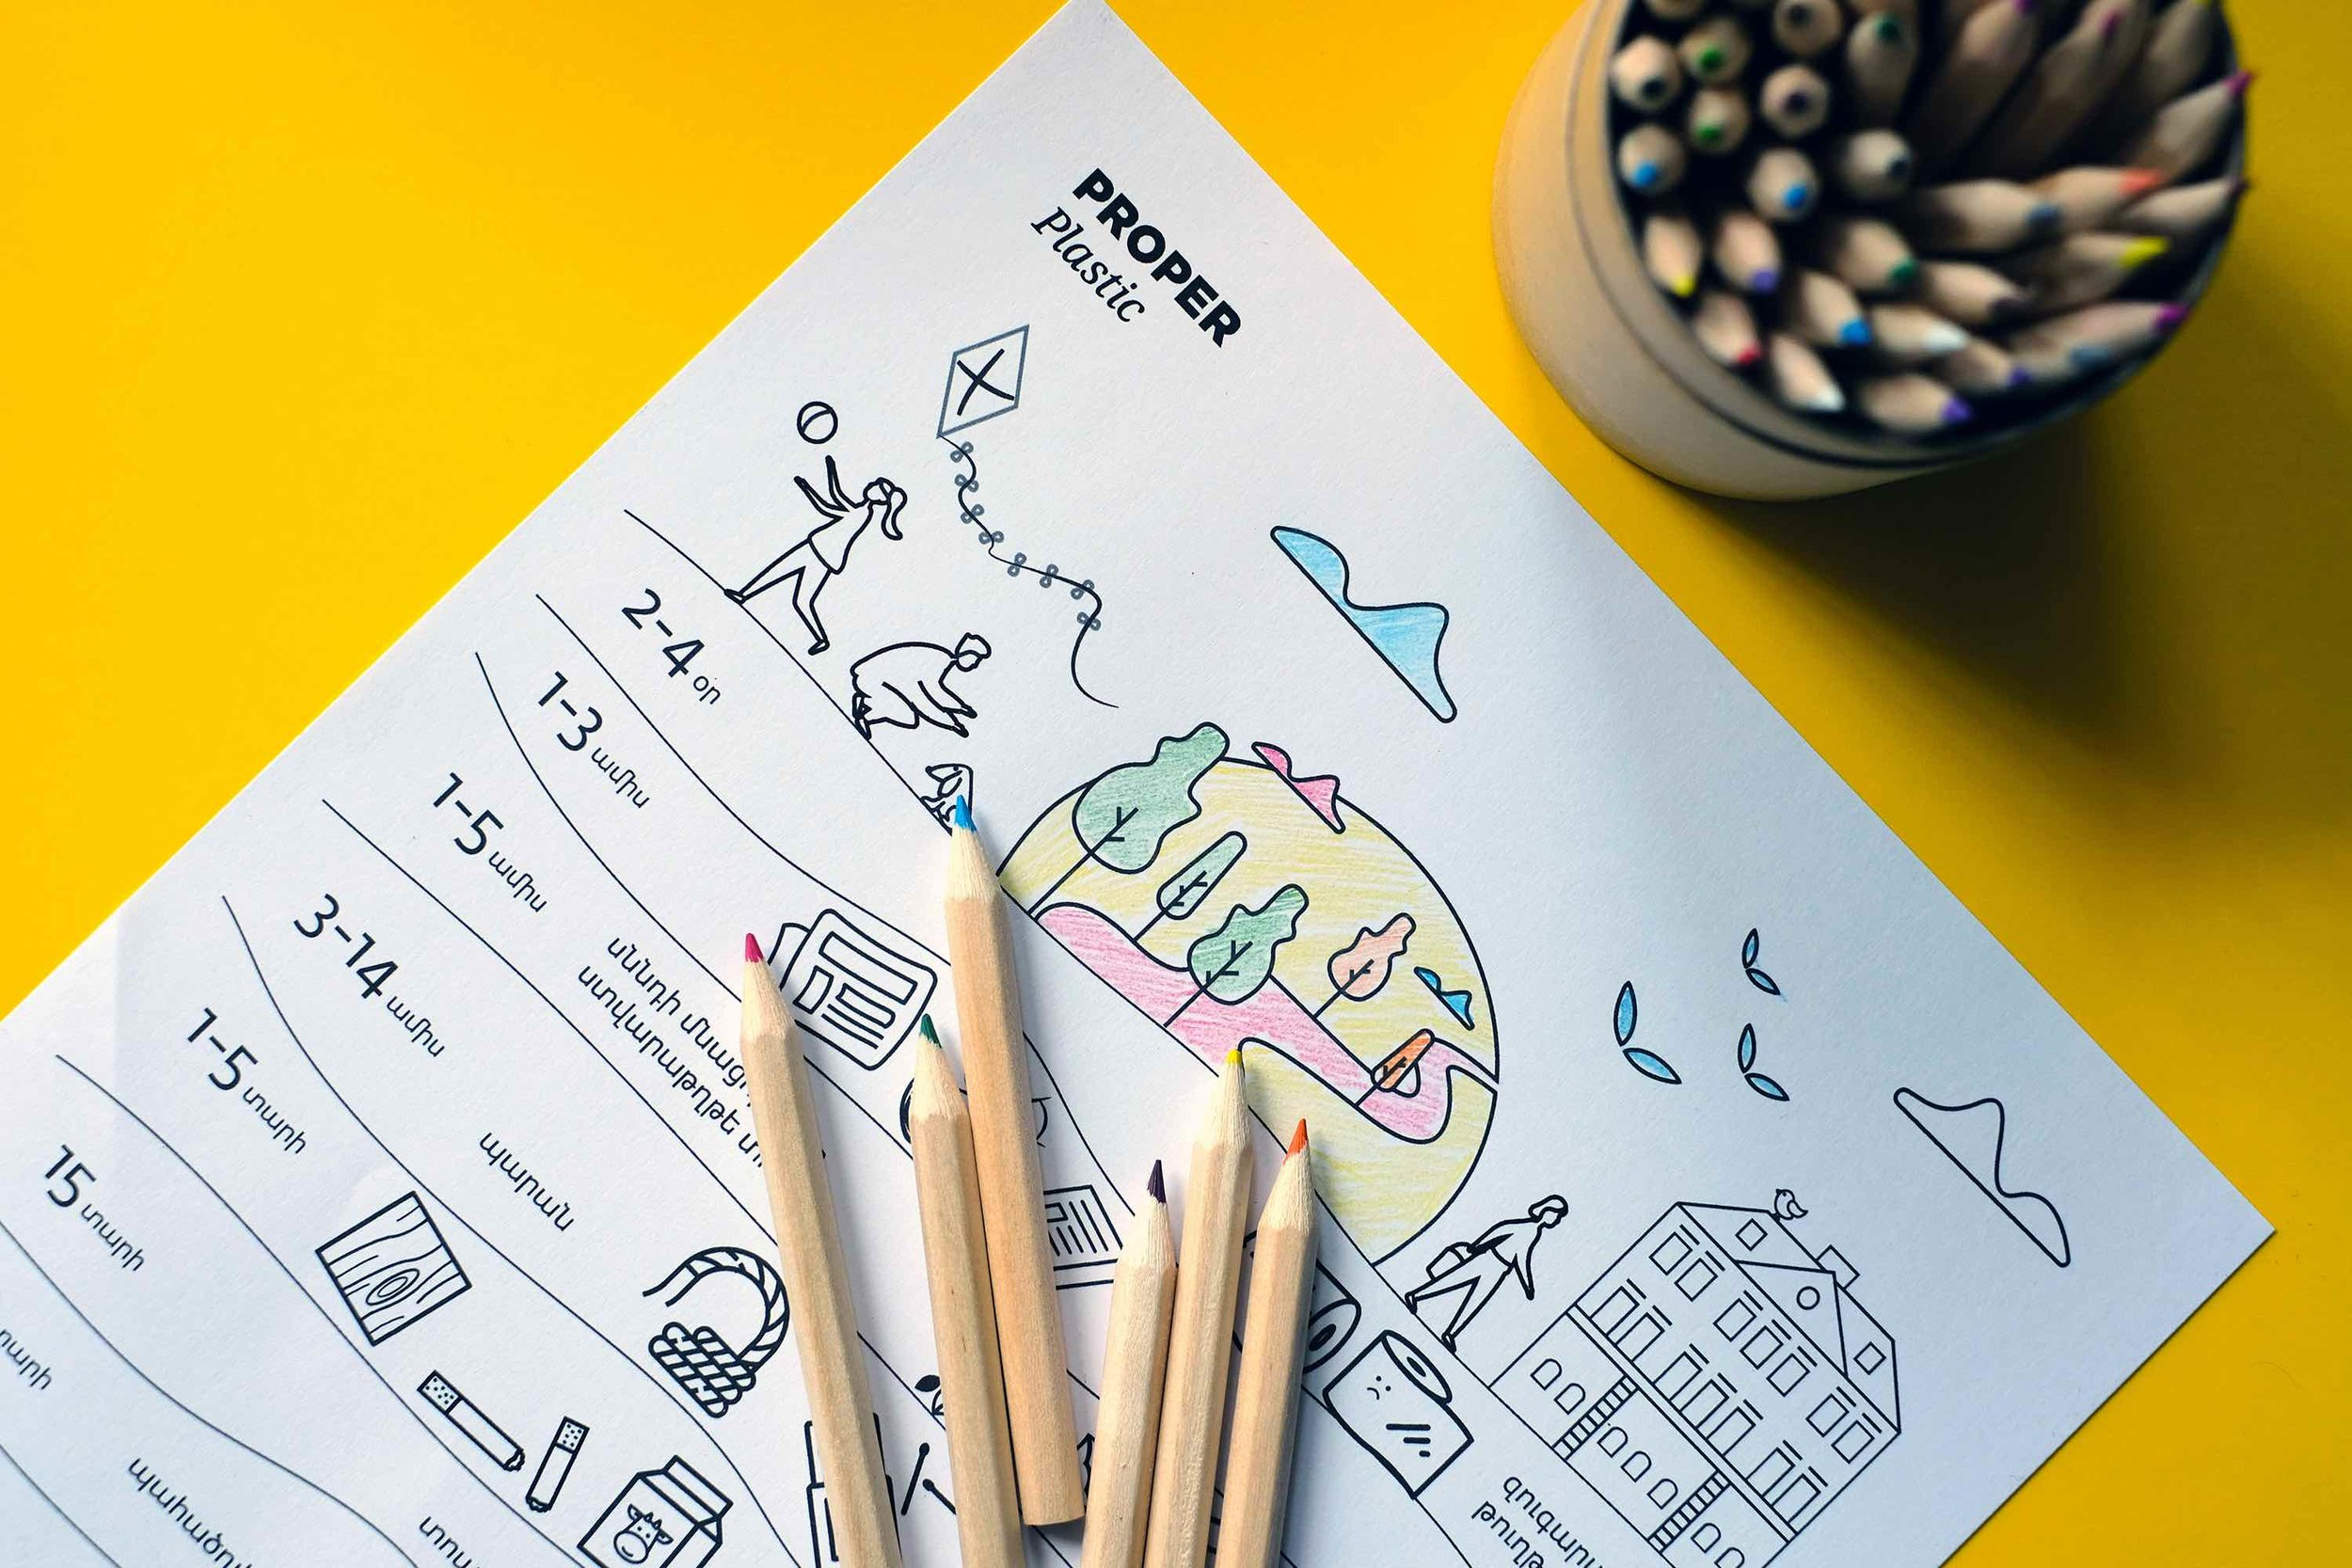 Proper Plastic coloring activity for children